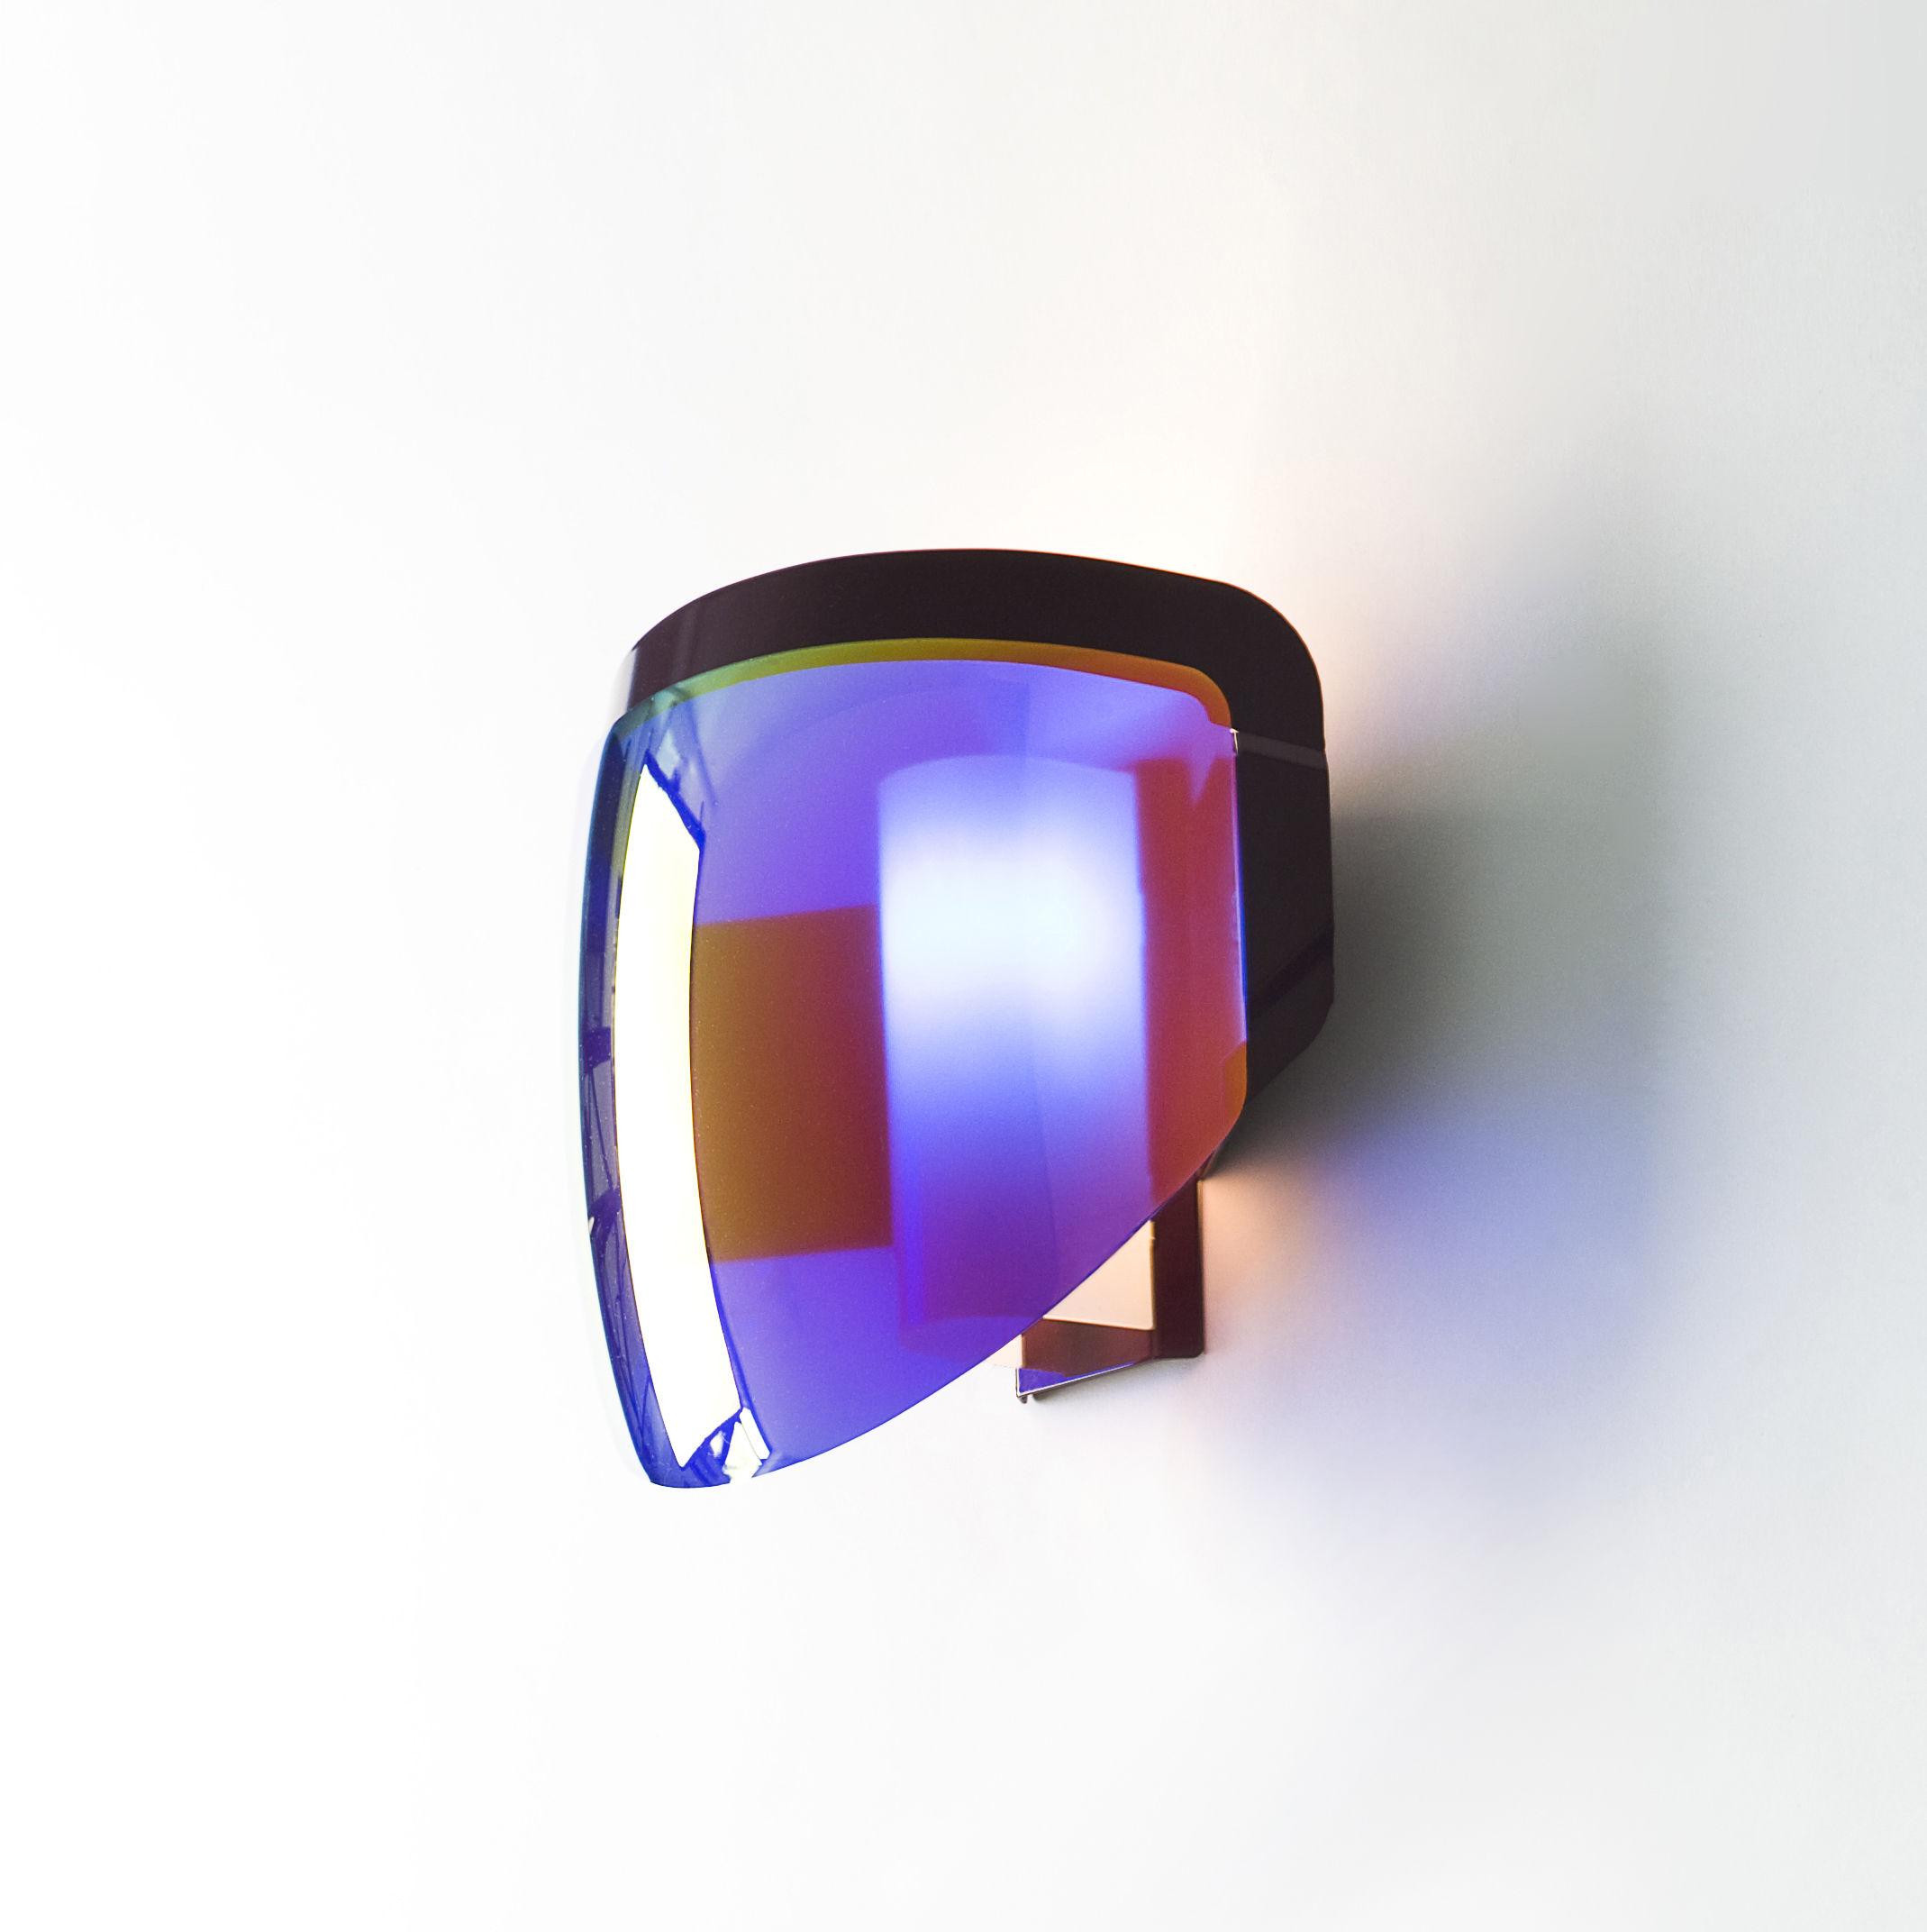 applique avec prise moto moustache violet l 29 x h 24 made in design. Black Bedroom Furniture Sets. Home Design Ideas